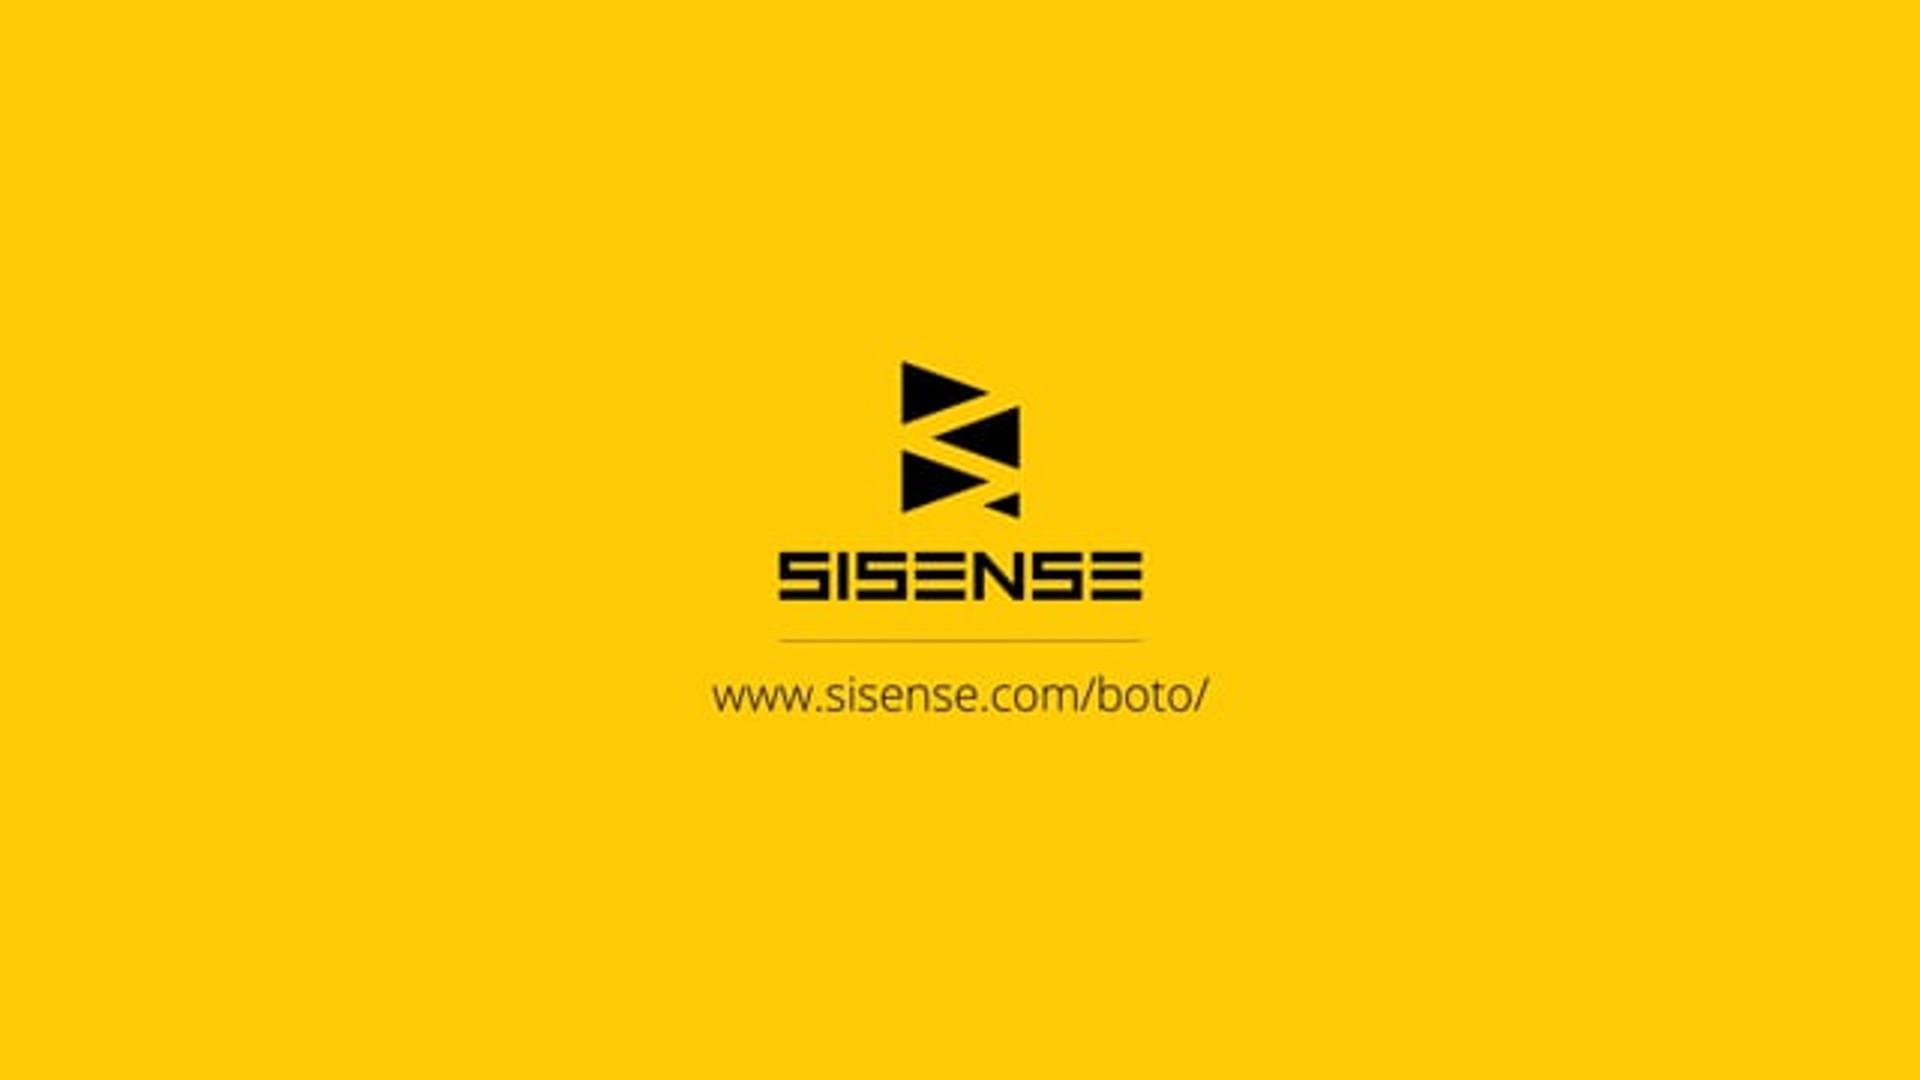 Sisense